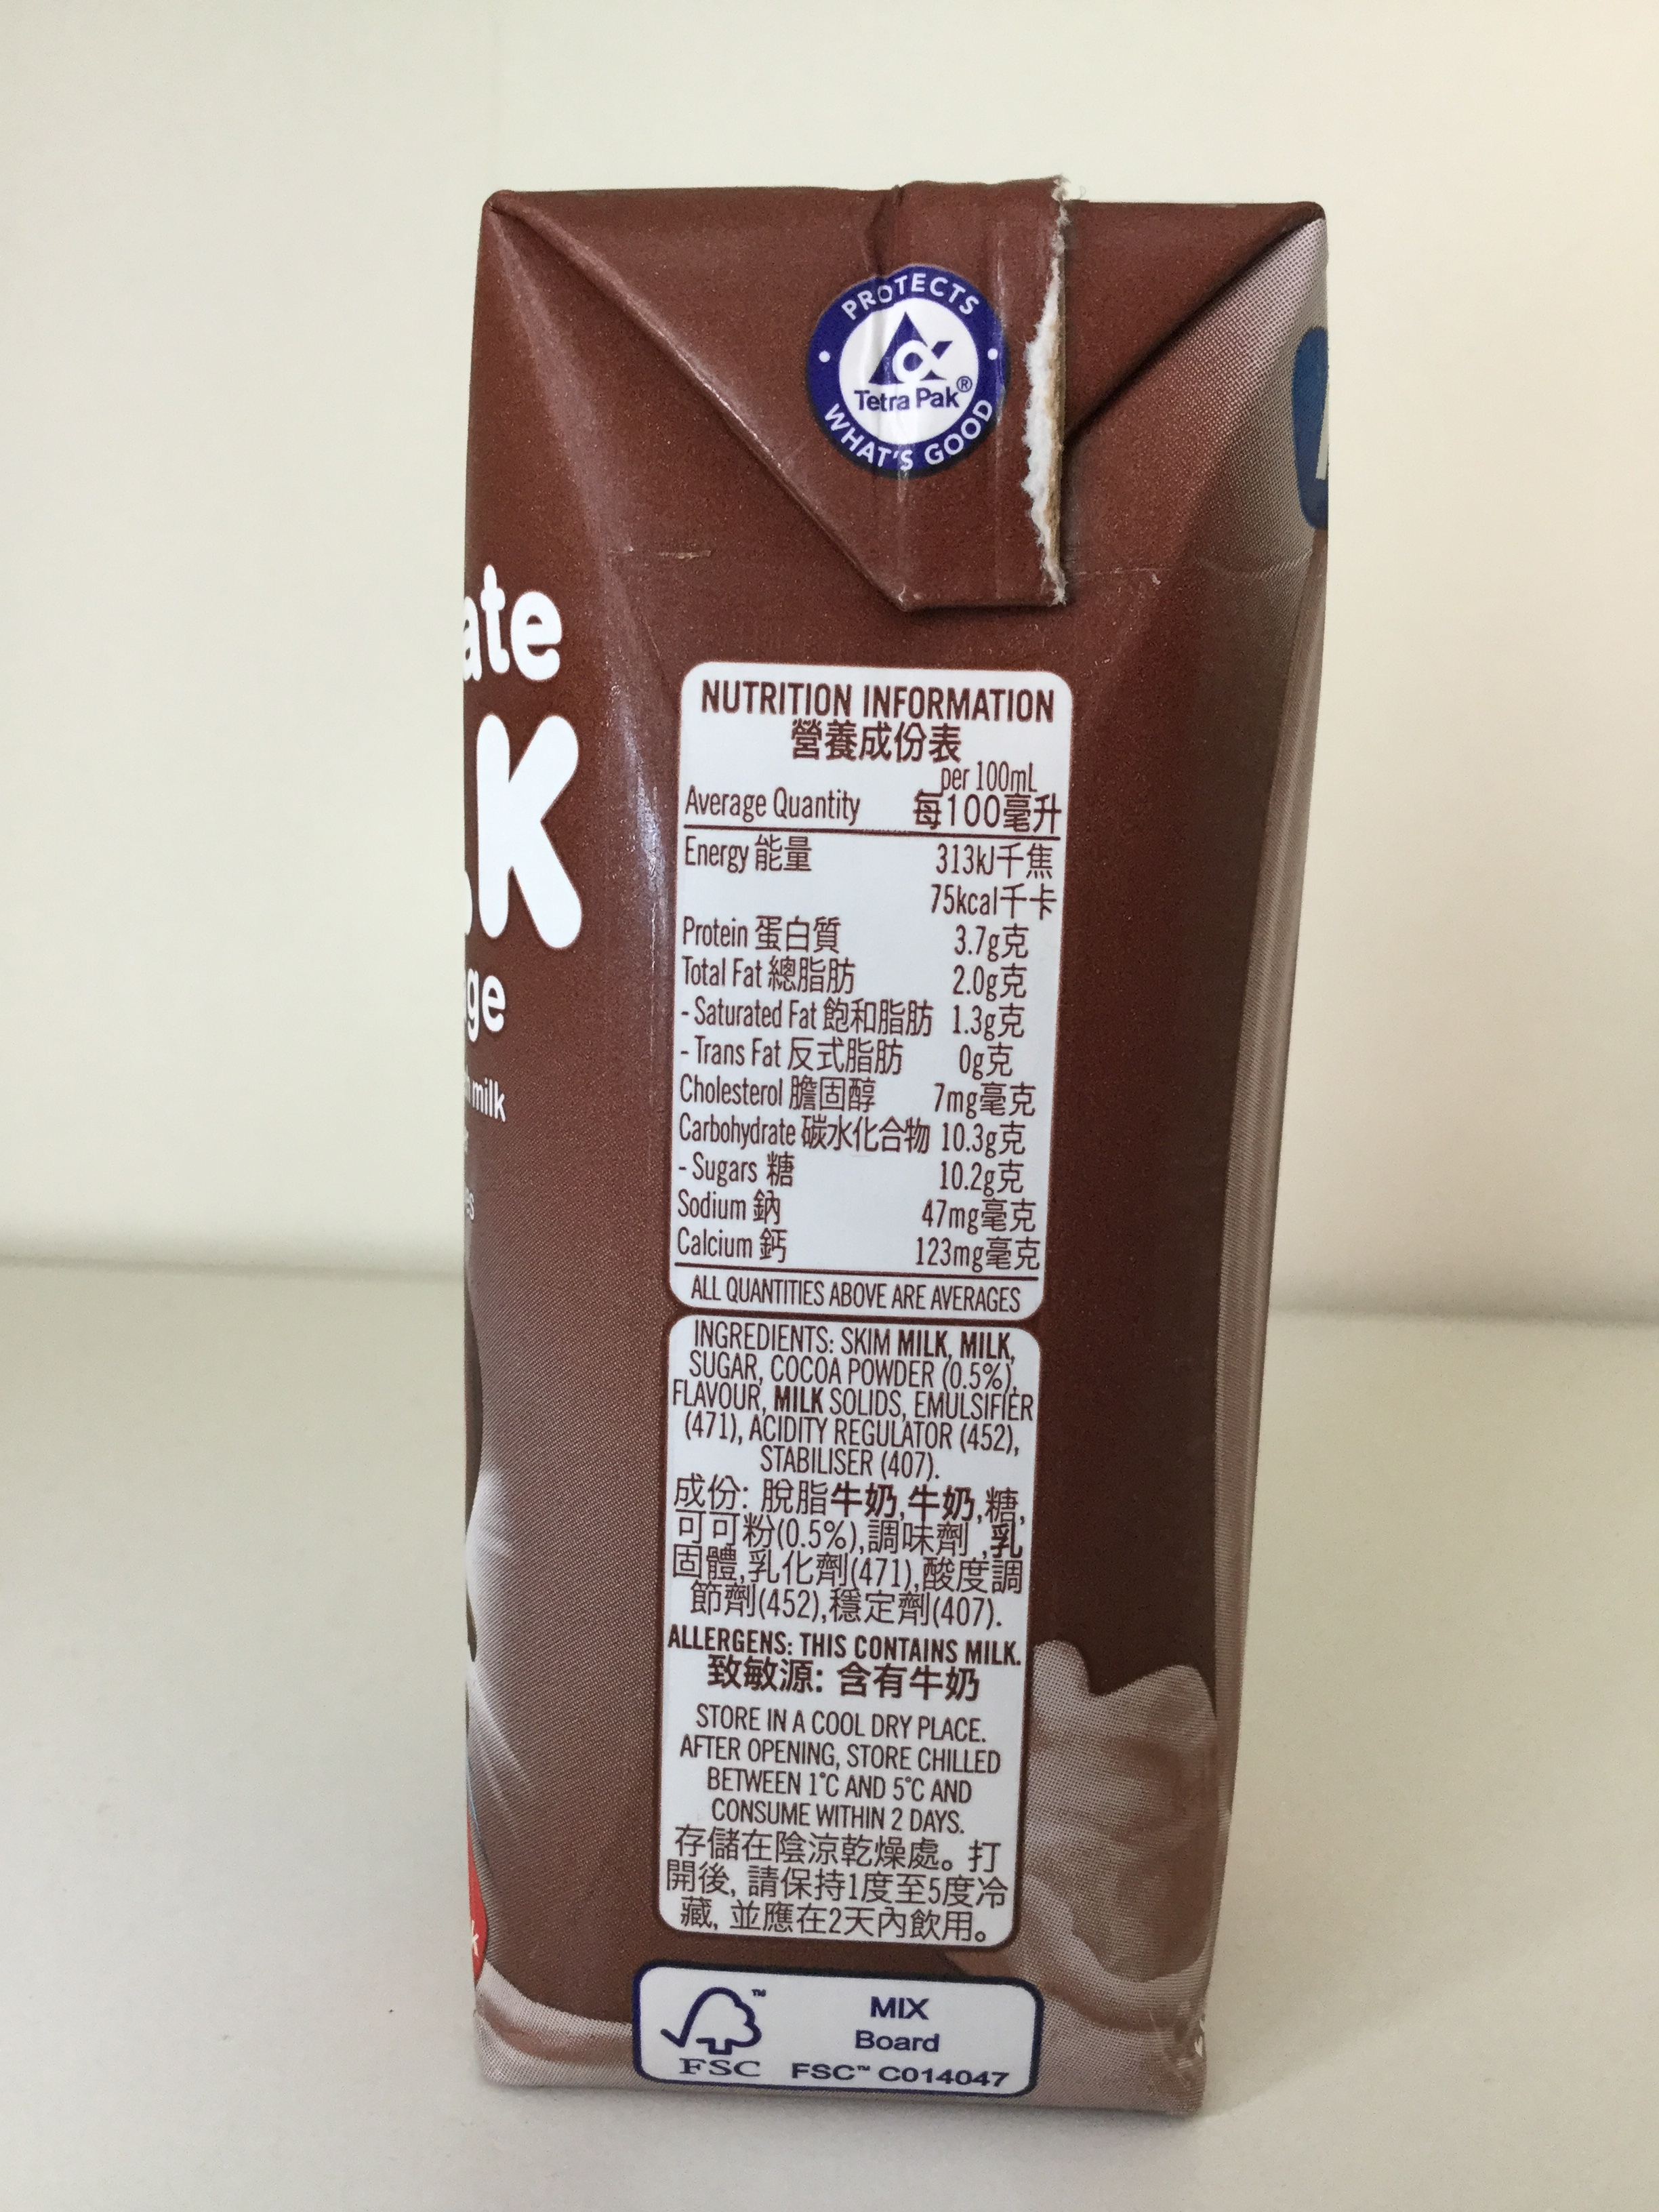 Pauls Chocolate Milk Side 1